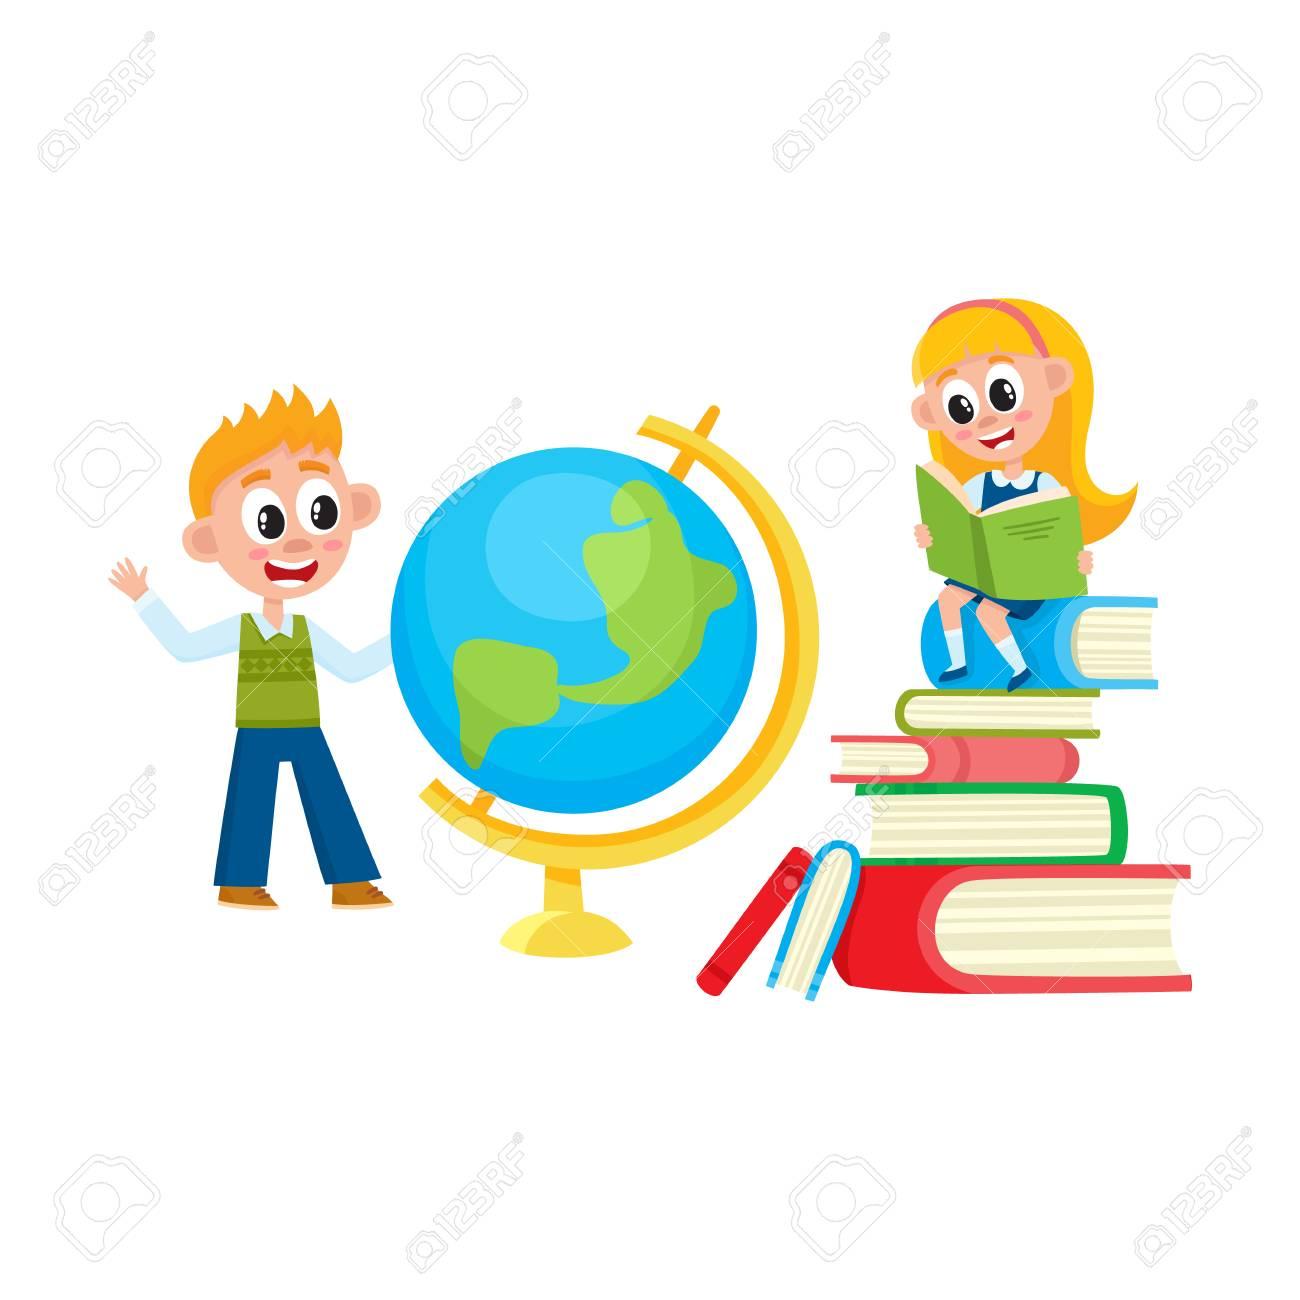 Aprendizaje De Niños Niña Leyendo Niño Estudiando Globo Regreso A